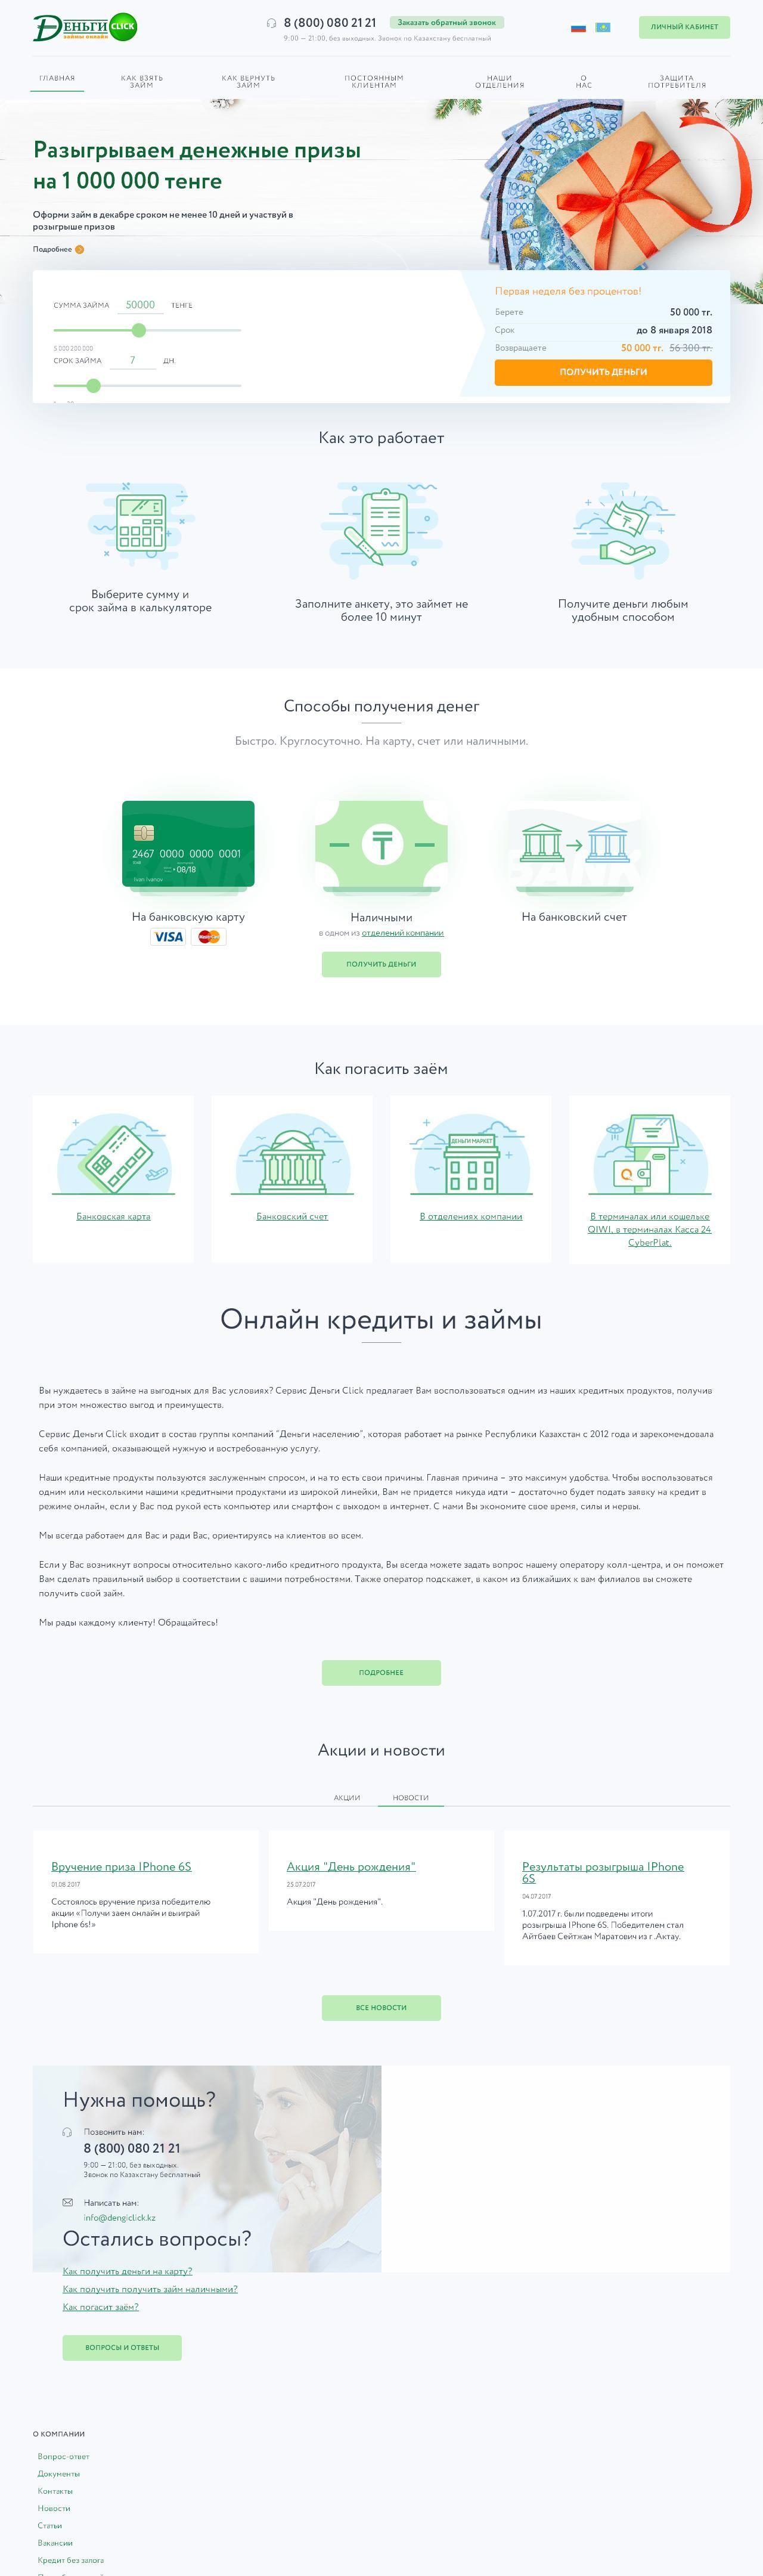 новые онлайн займы рк агент гейт хоум кредит банк